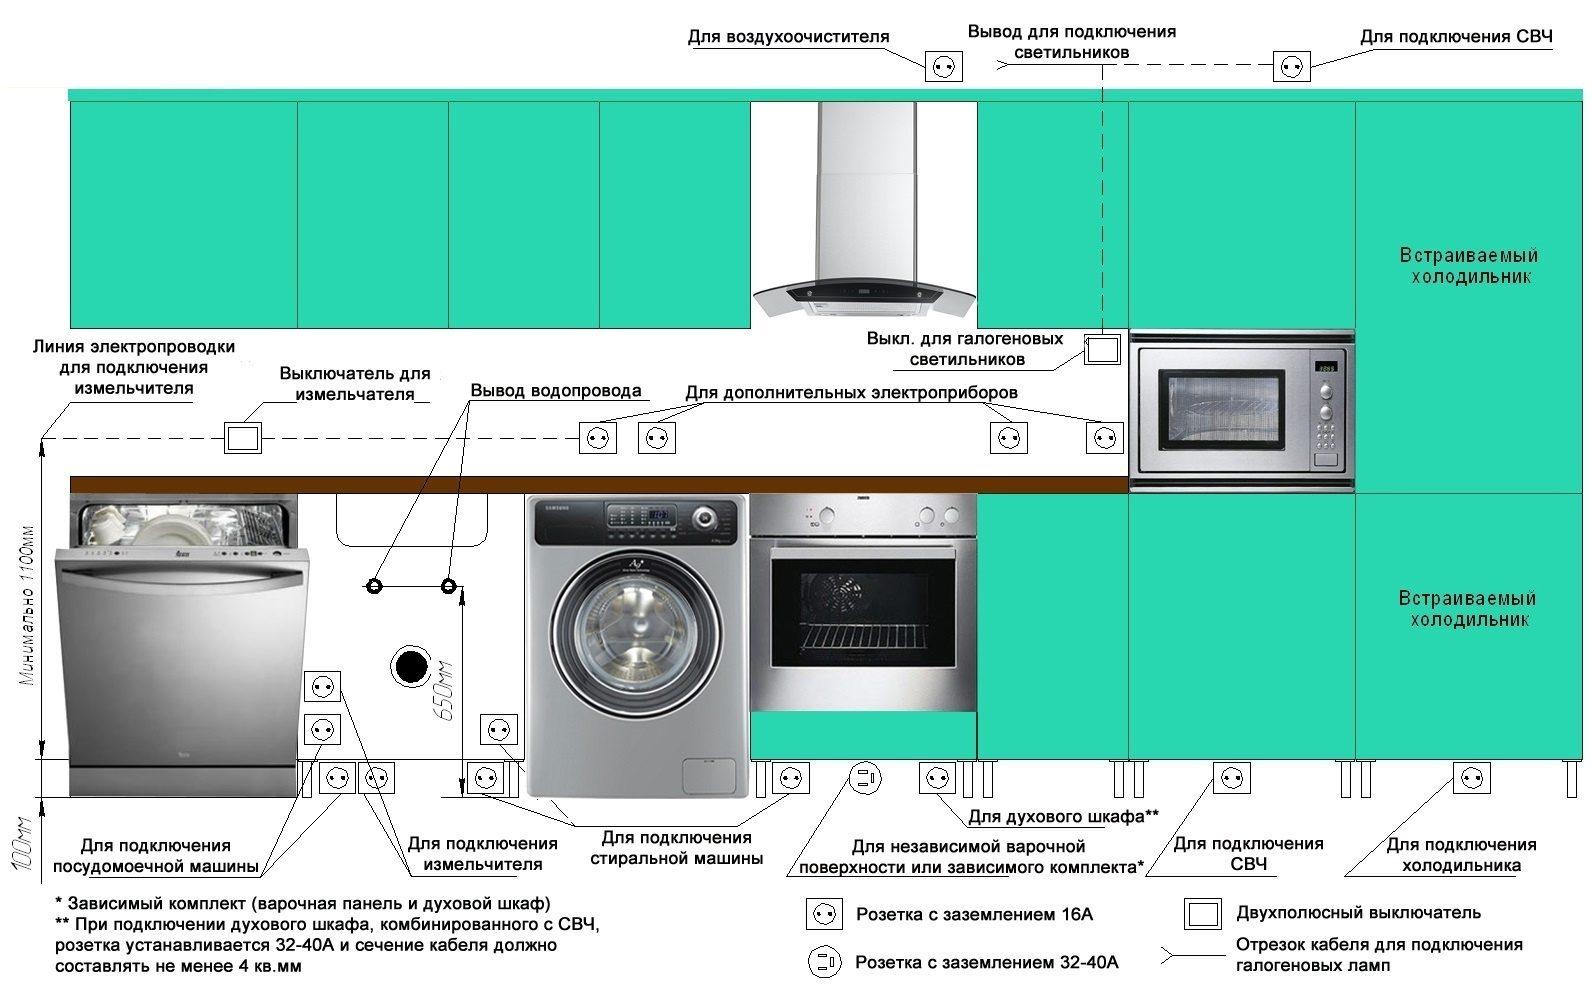 Как провести проводку на кухне своими руками